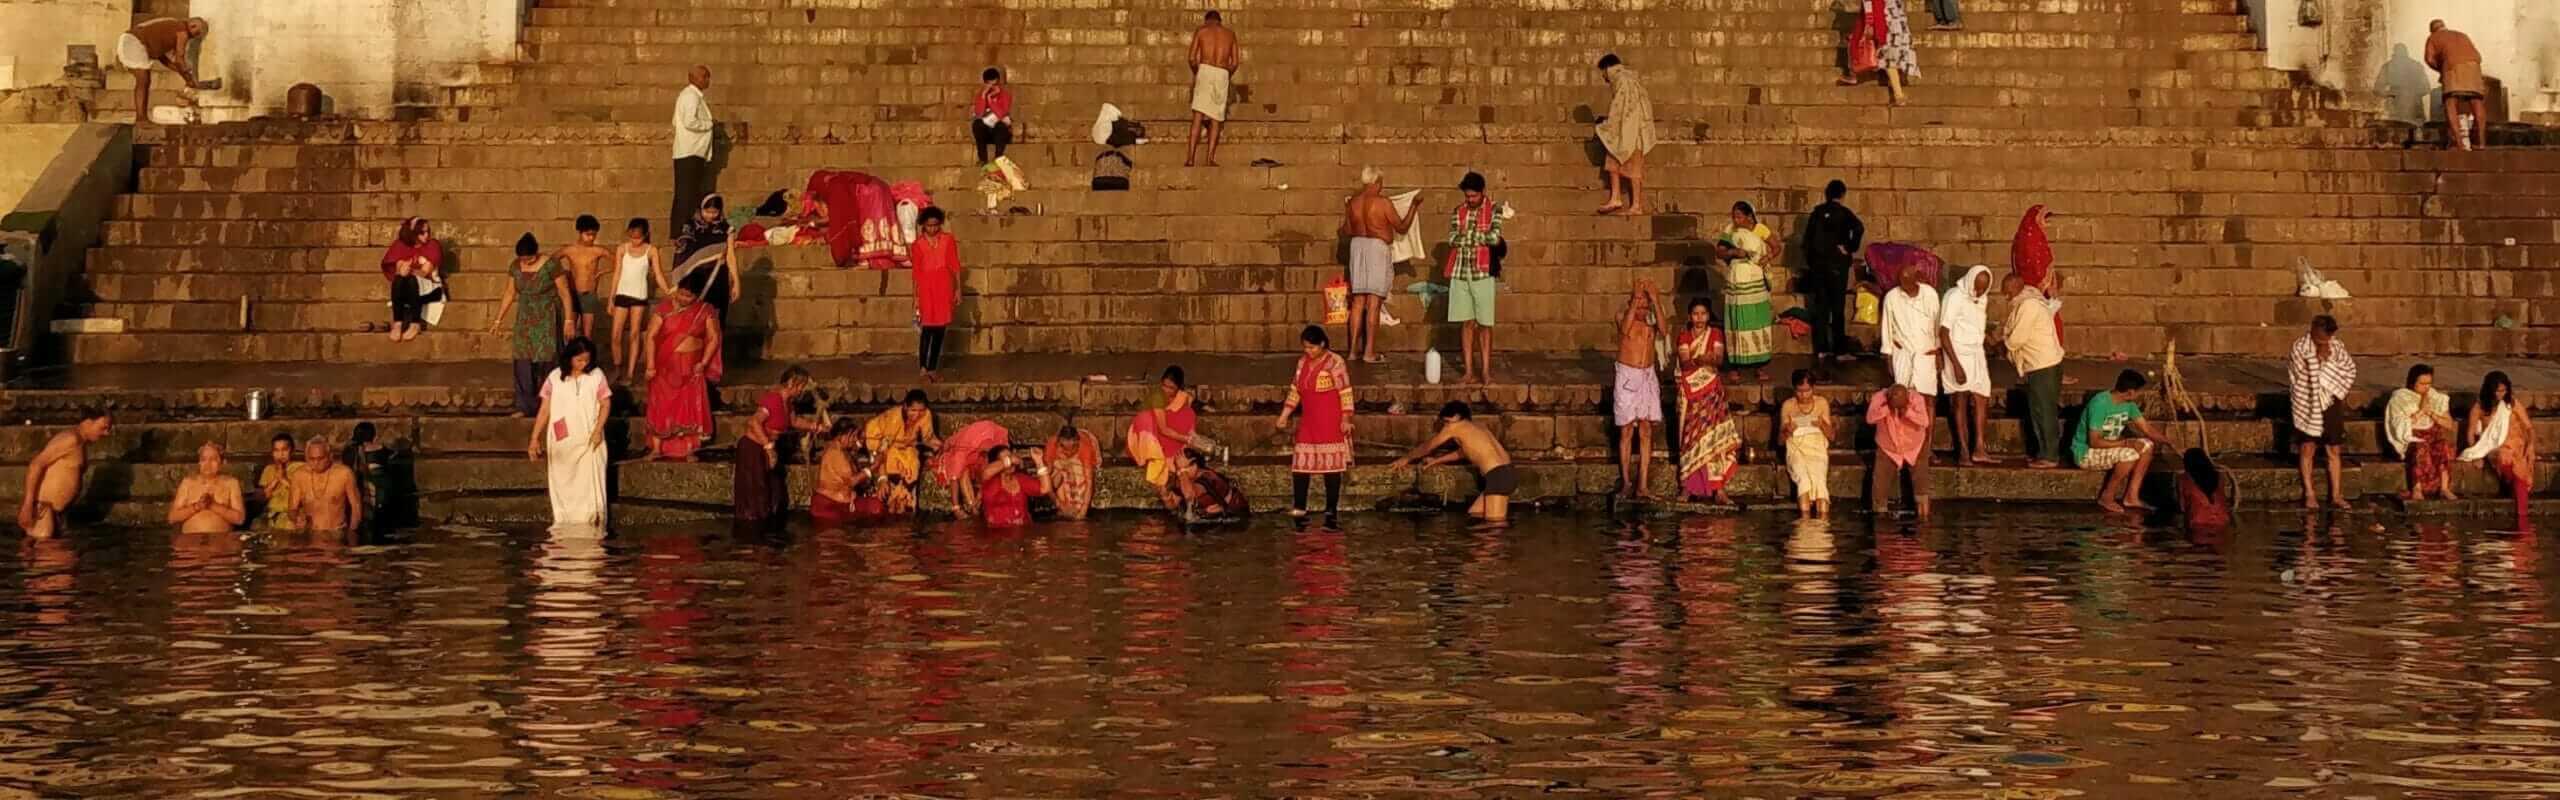 Hindus bathing in the polluted Ganges River in Varanasi at the Vijaya Nagaram Ghat